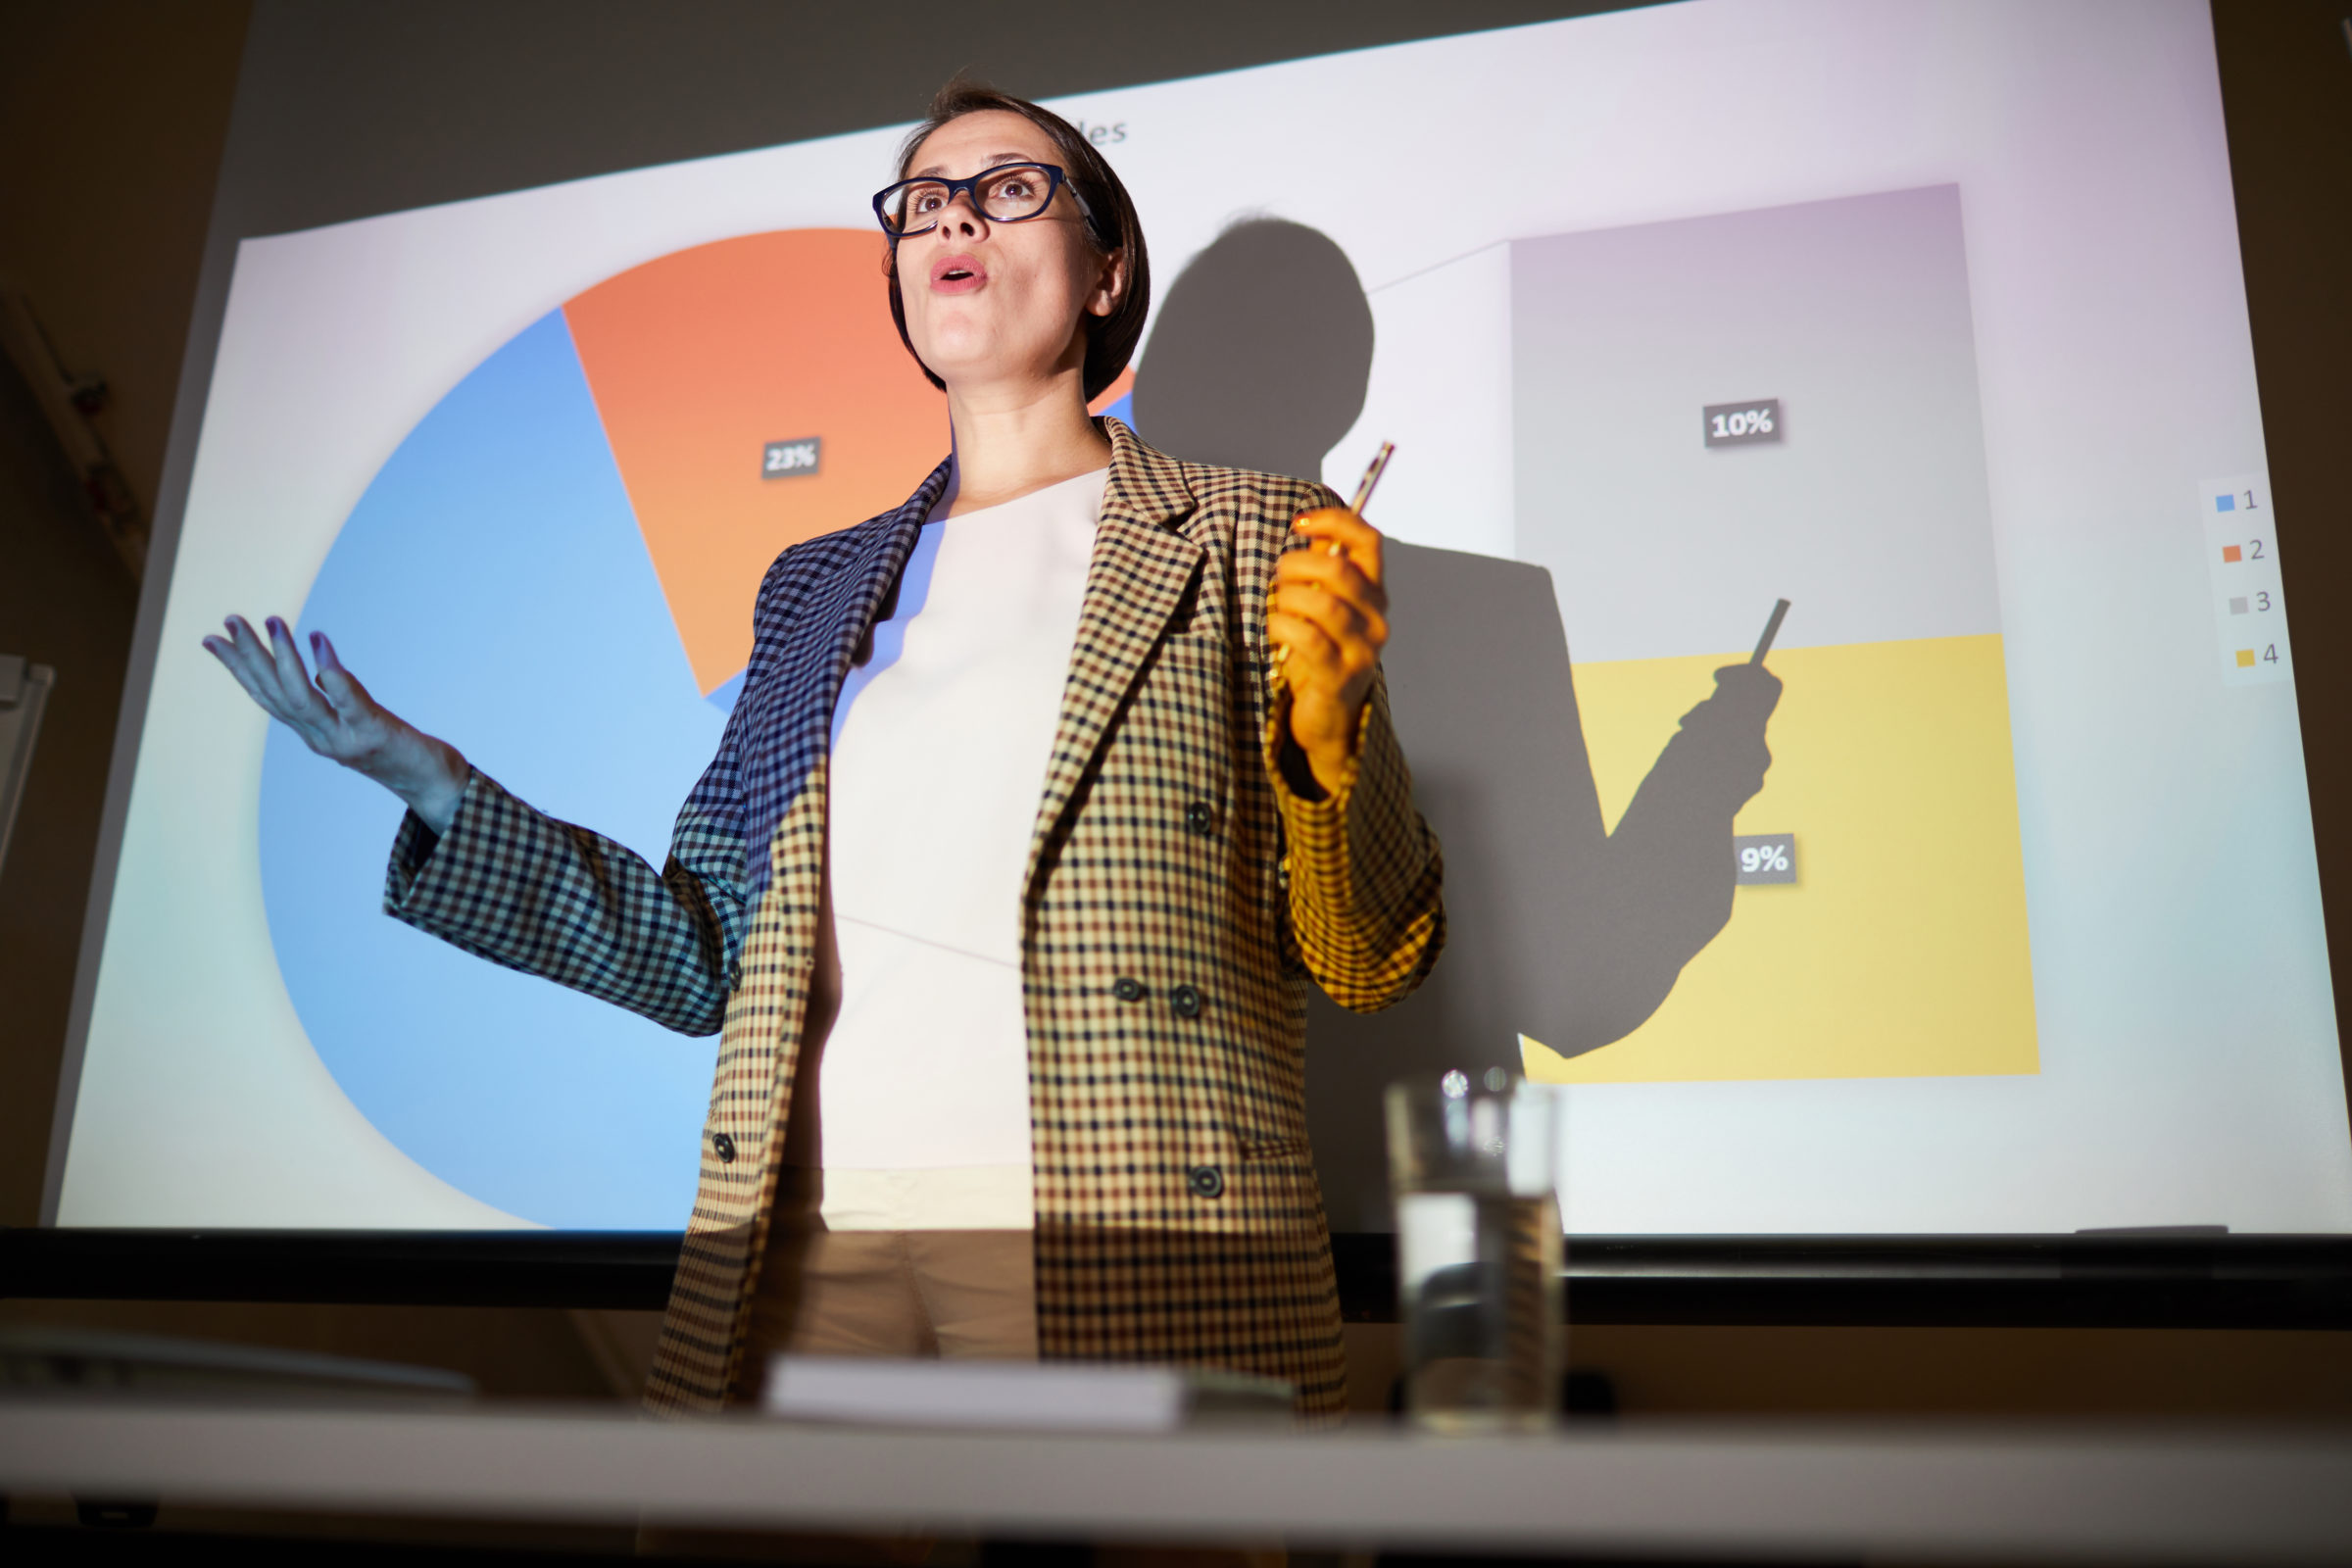 confident lady explaining data on projection scree 7HJMCVN